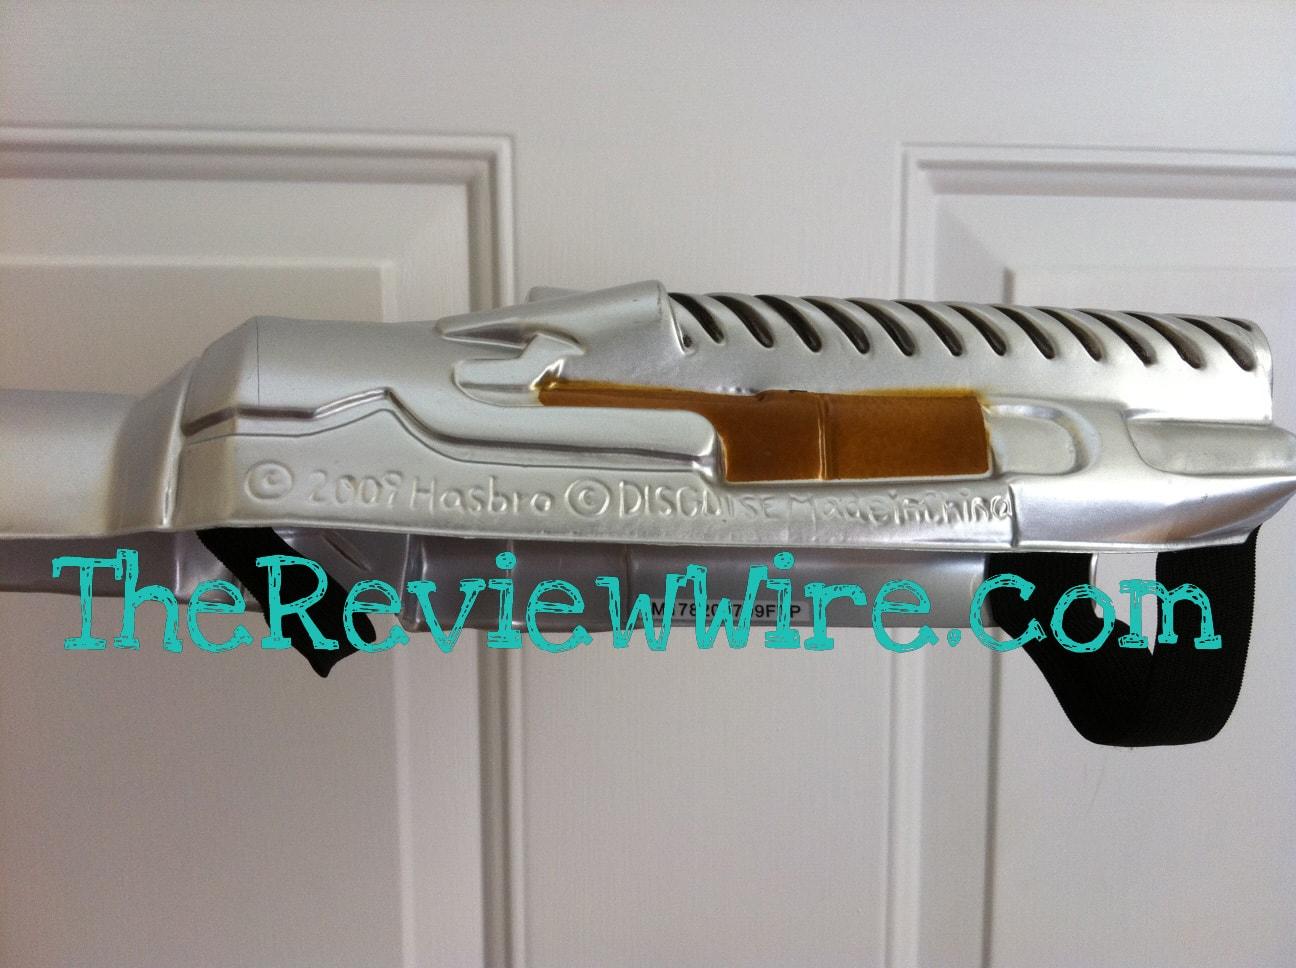 Transformers Gun